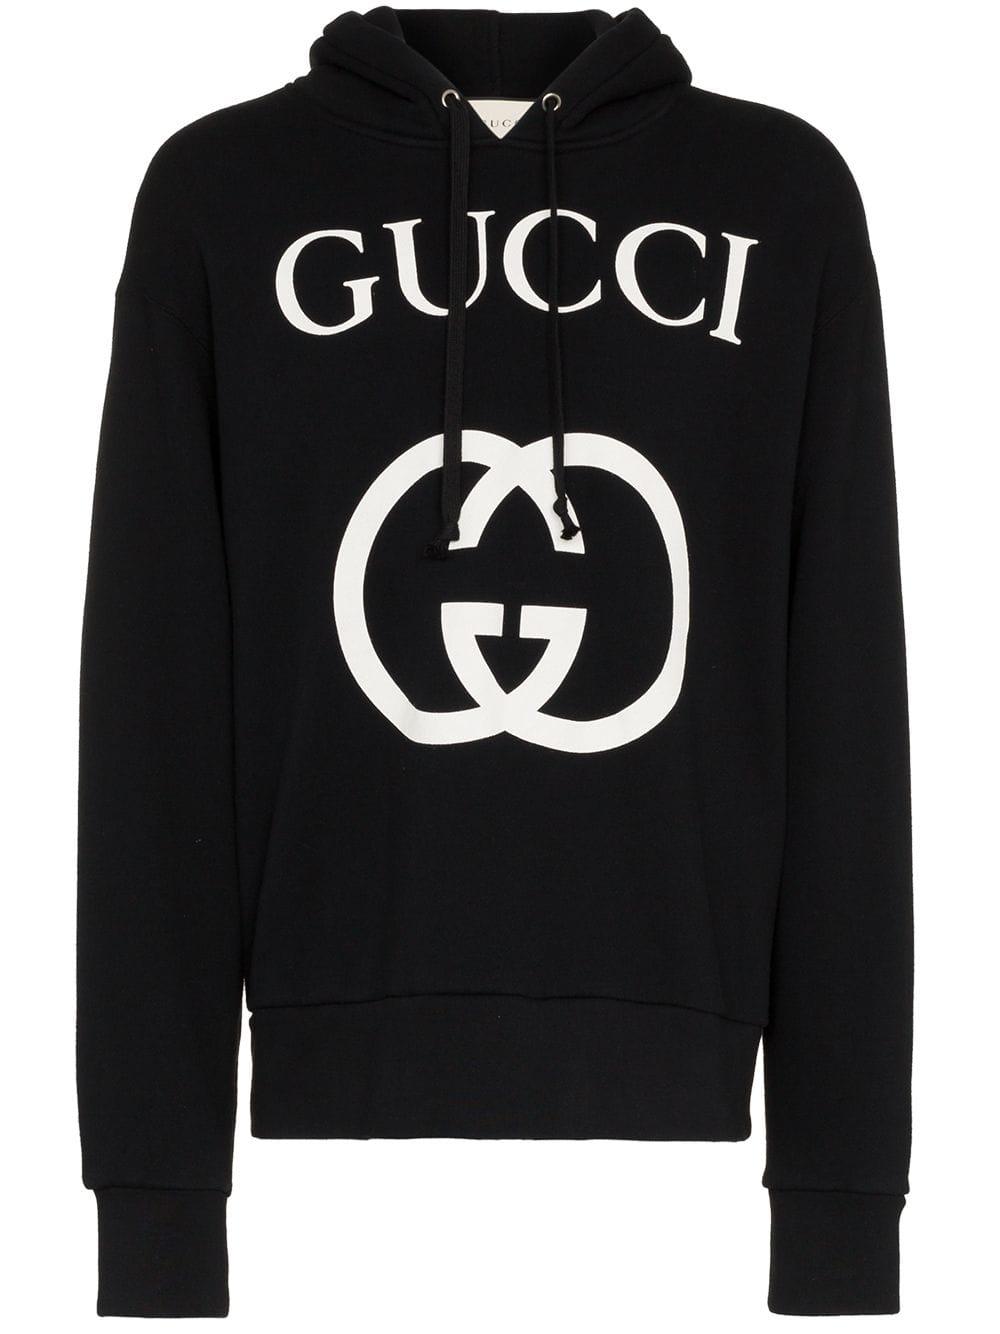 a0d47d75645 Gucci Interlocking G Logo Cotton Hoodie - Black